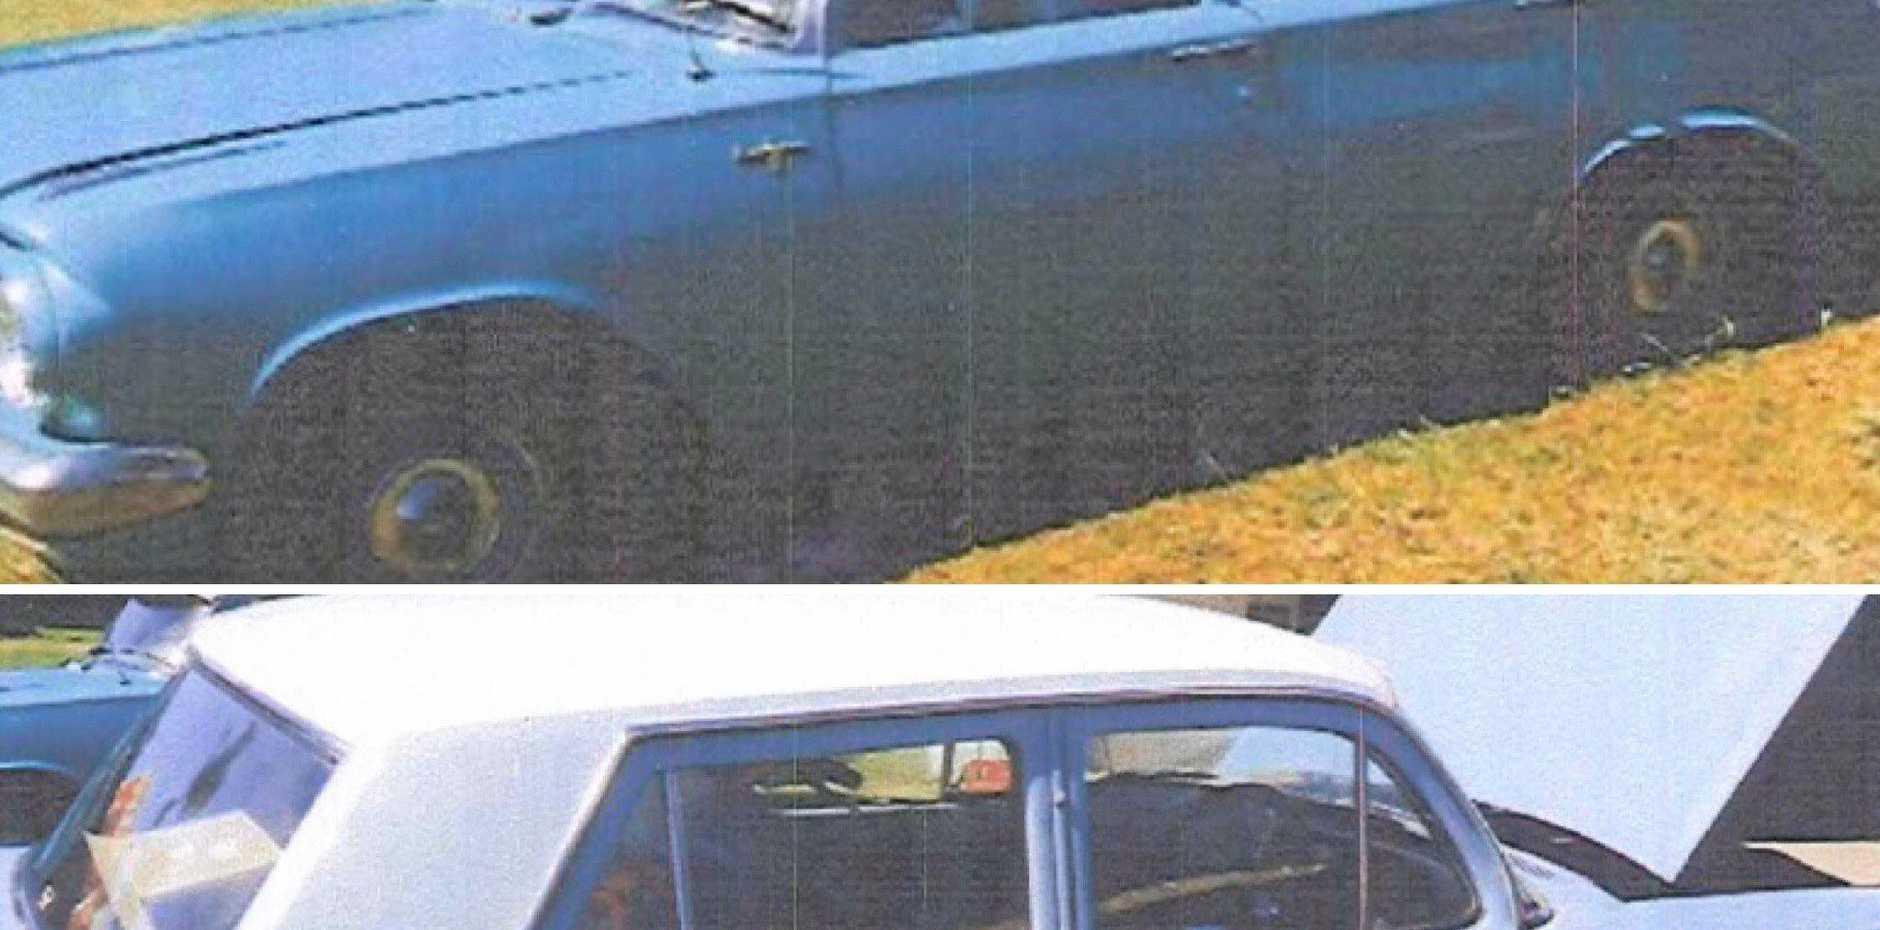 STOLEN: The Holden station wagon and sedan.